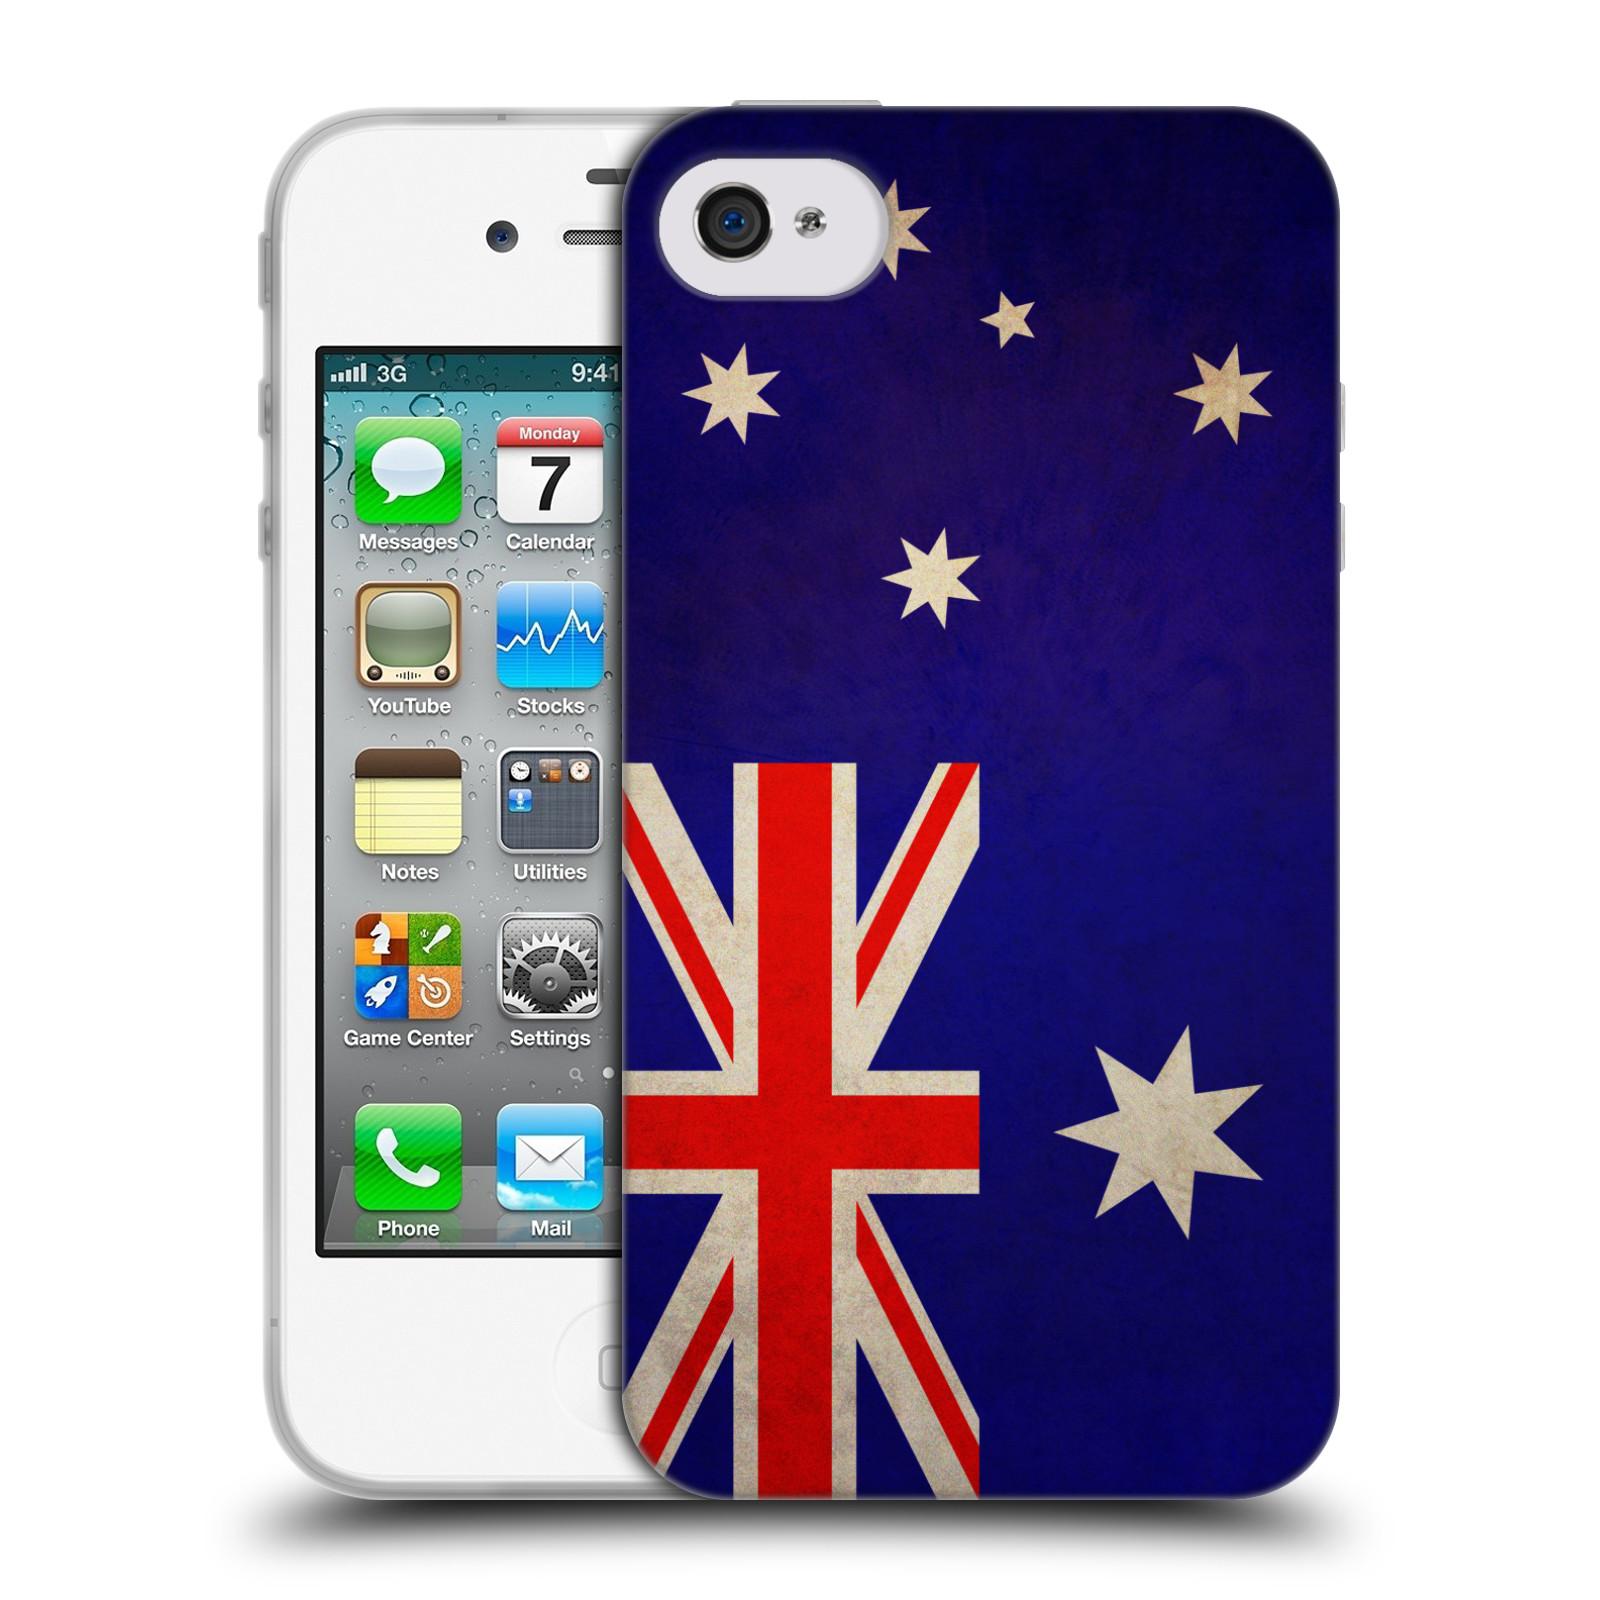 Silikonové pouzdro na mobil Apple iPhone 4 a 4S HEAD CASE VLAJKA AUSTRÁLIE (Silikonový kryt či obal na mobilní telefon Apple iPhone 4 a 4S)